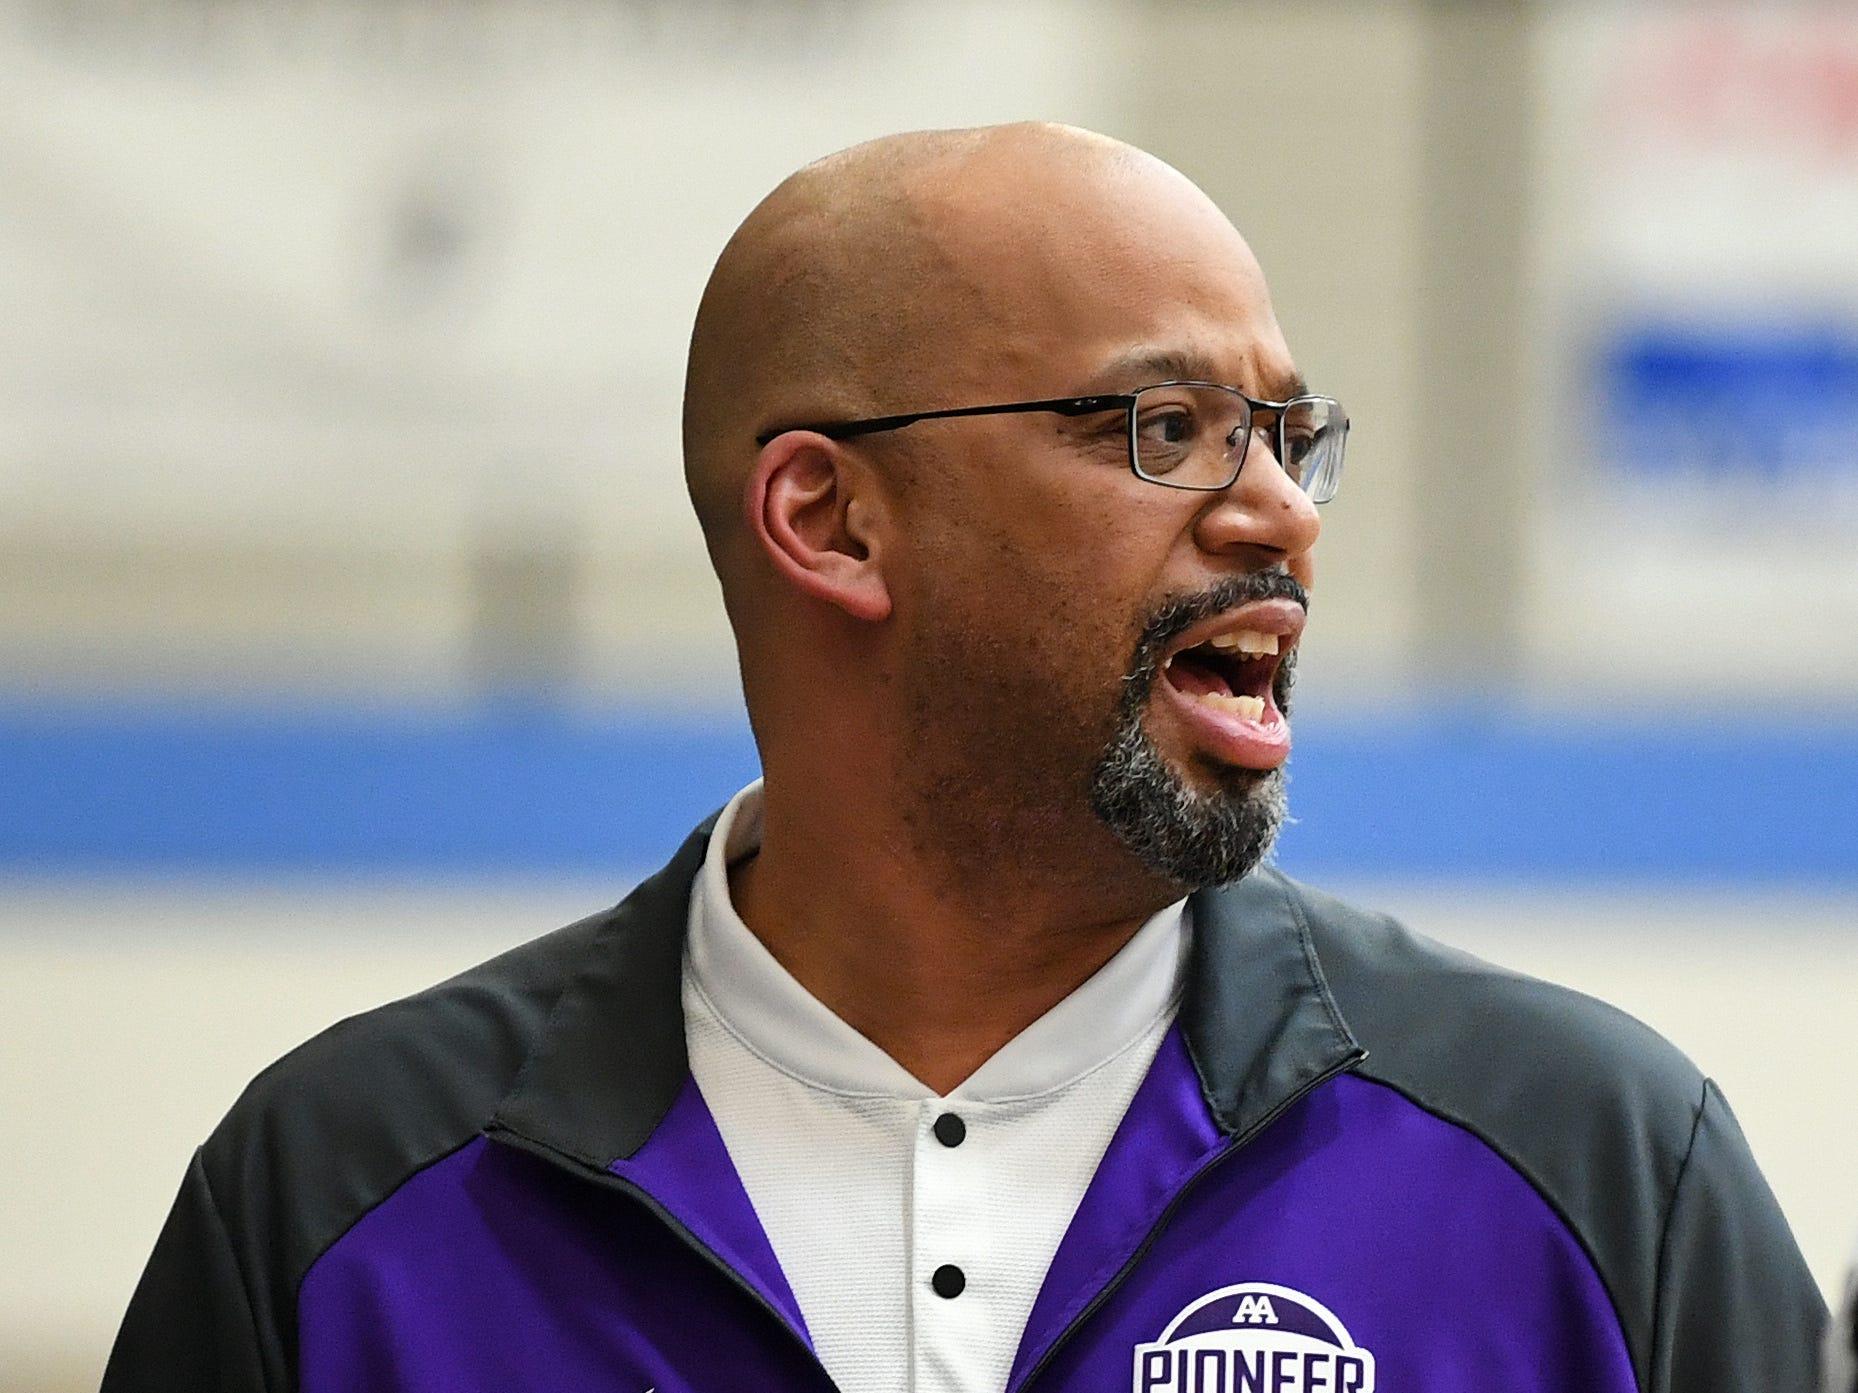 Ann Arbor Pioneer girls basketball head coach Tyrone Hicks watches his team play against Wayne Memorial in the first quarter.